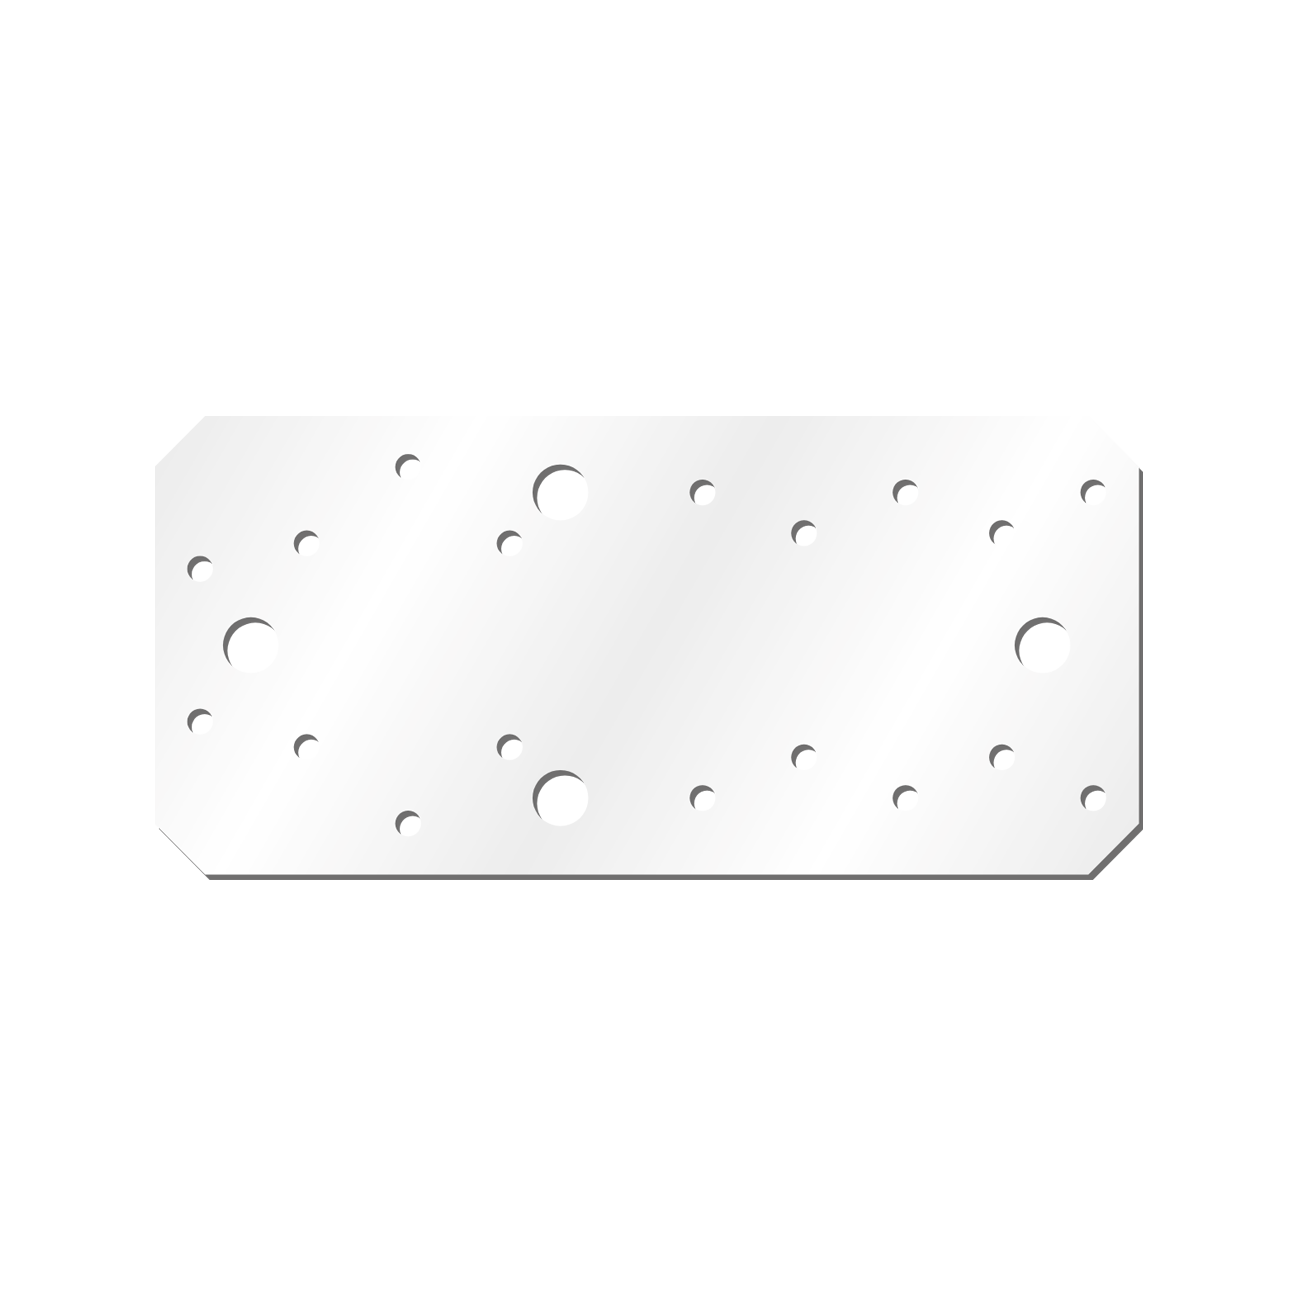 Placuta Cp90v Vopsita Alb Electrostatic 174x60x2 Mm Perforatii 20×5.1-2×11.0